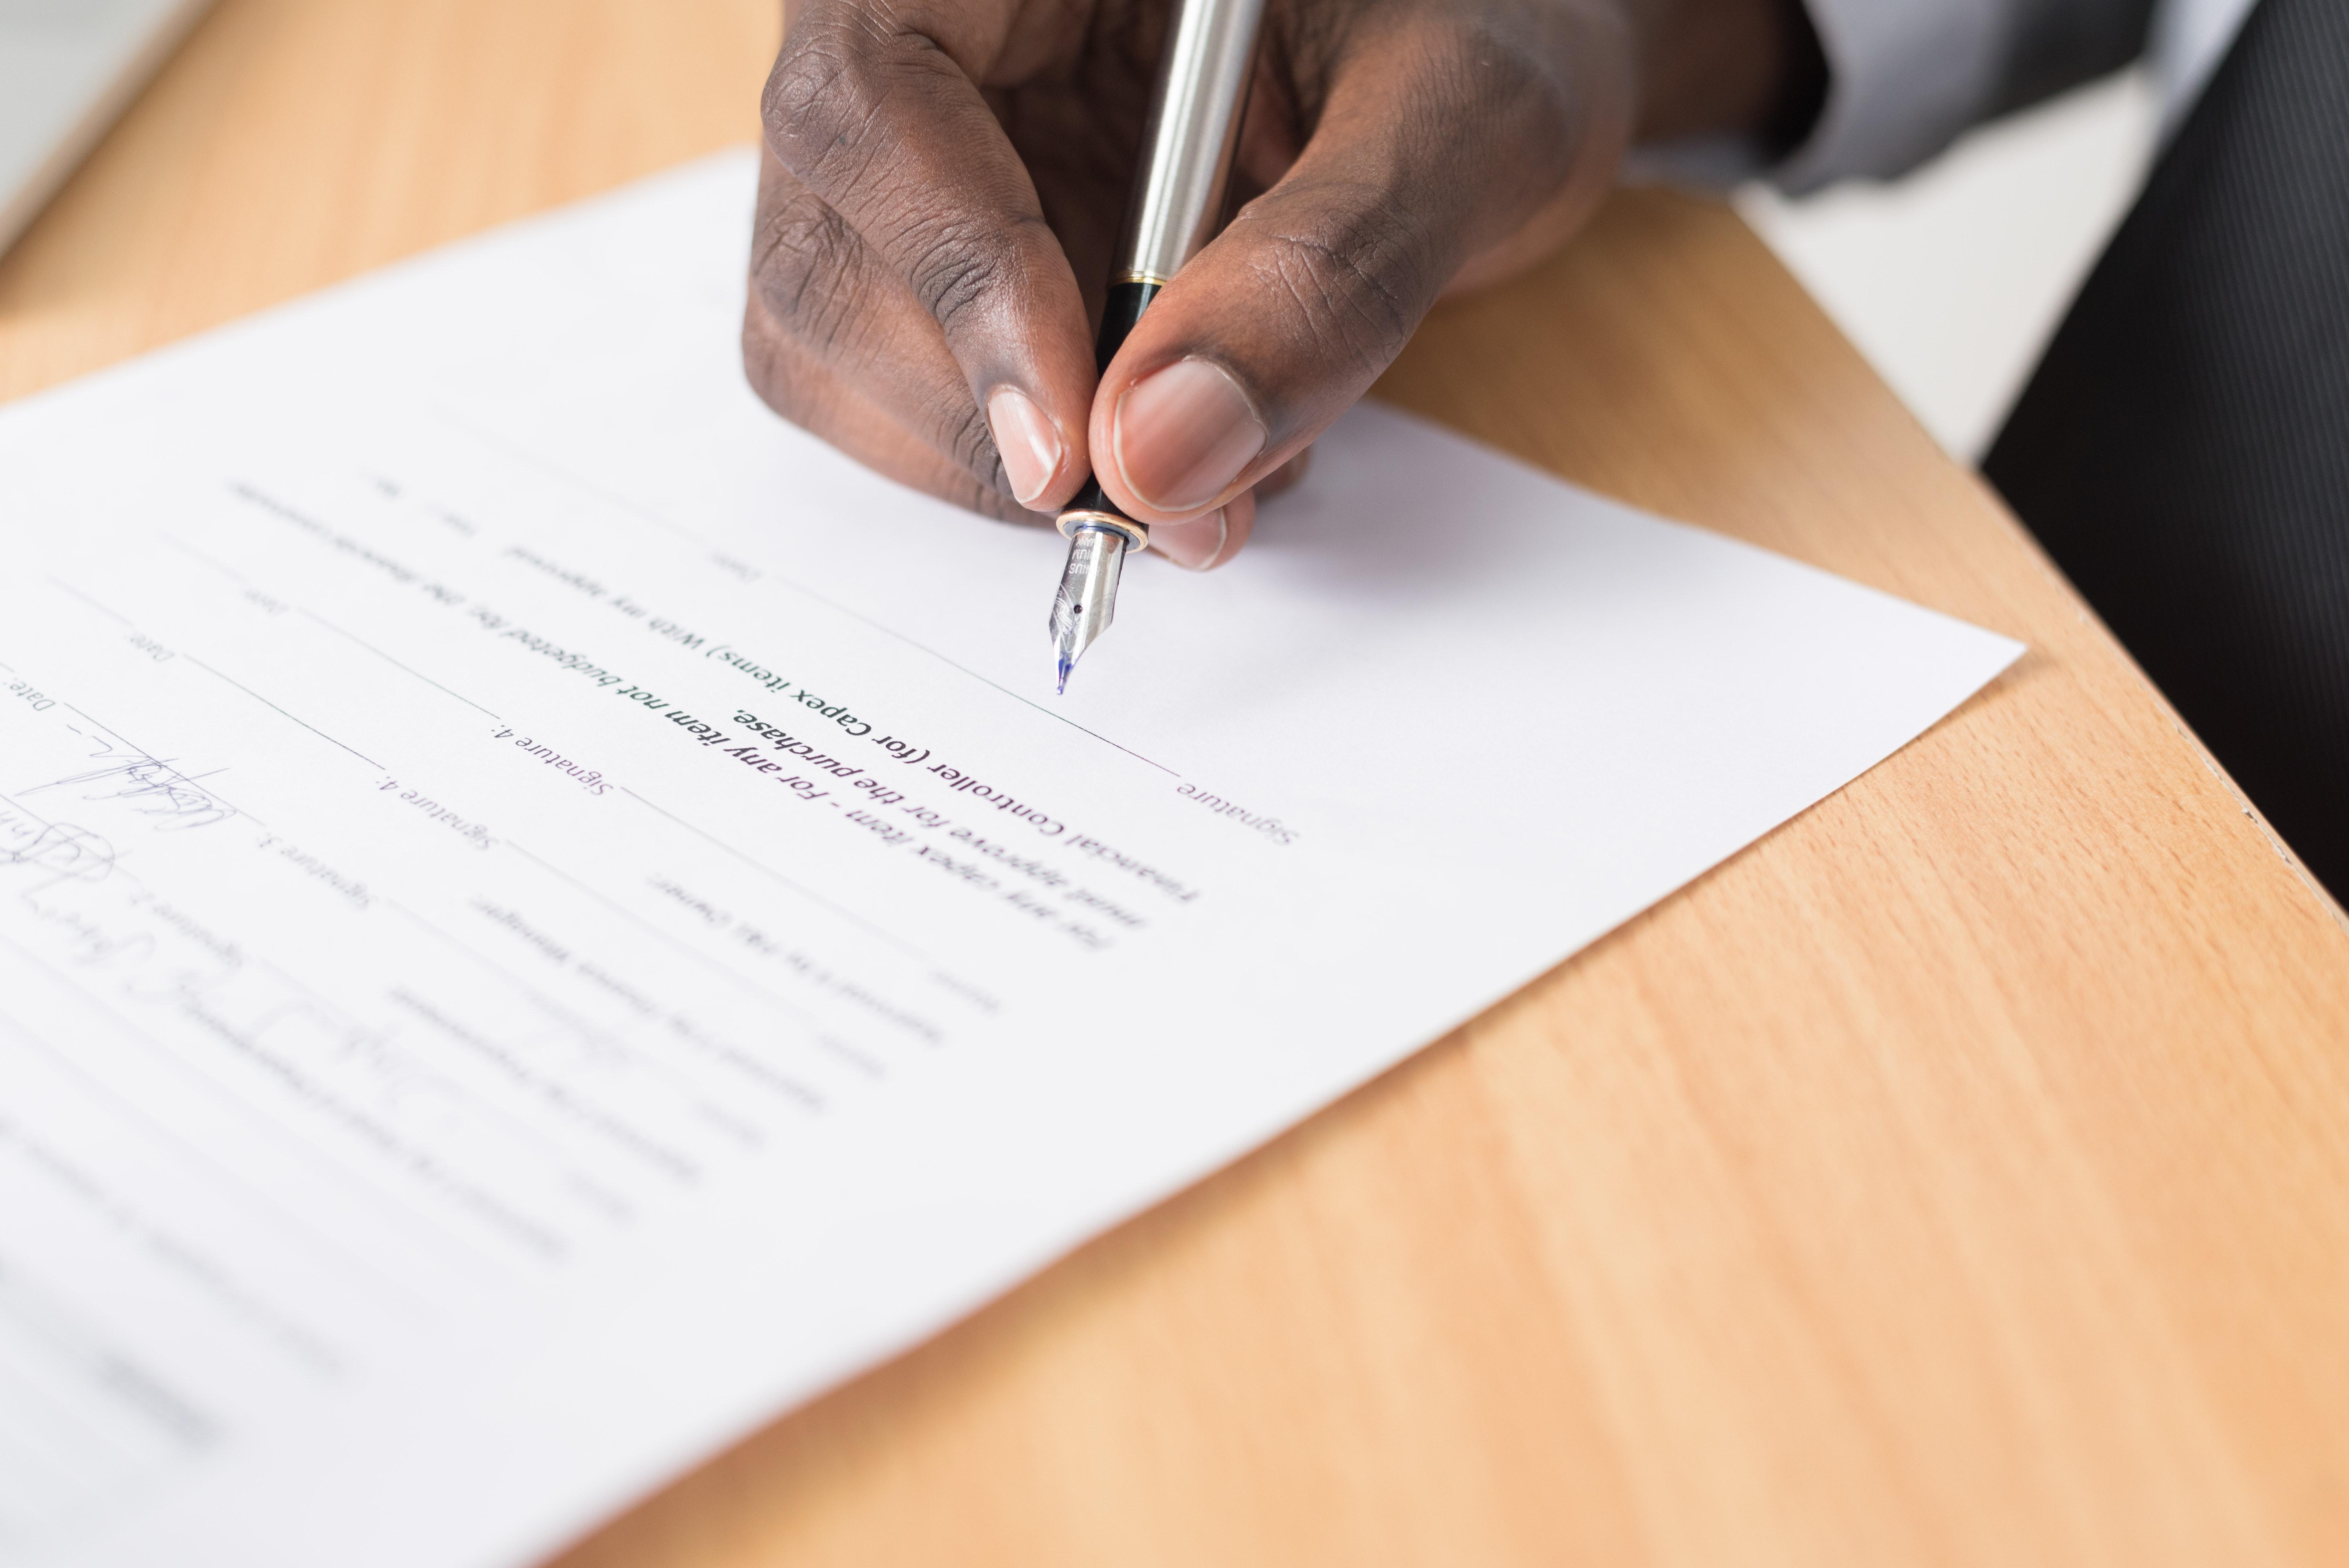 Guarantor and Guarantees: Know When to Say No